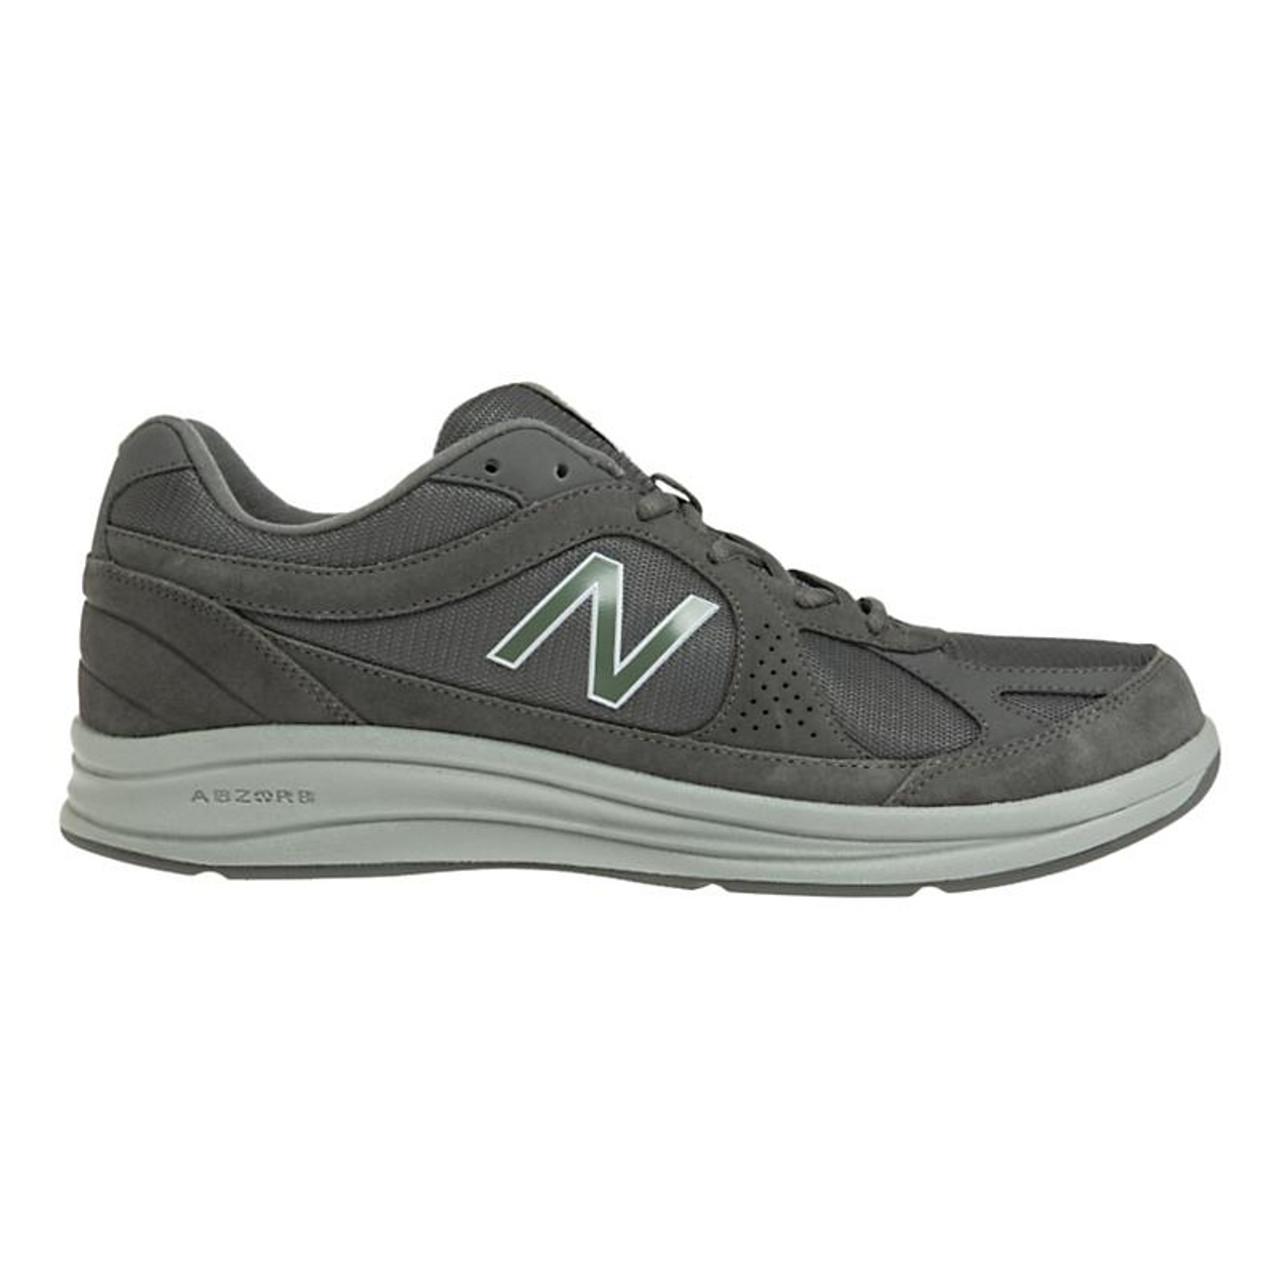 Men's New Balance 877 Walking Shoe